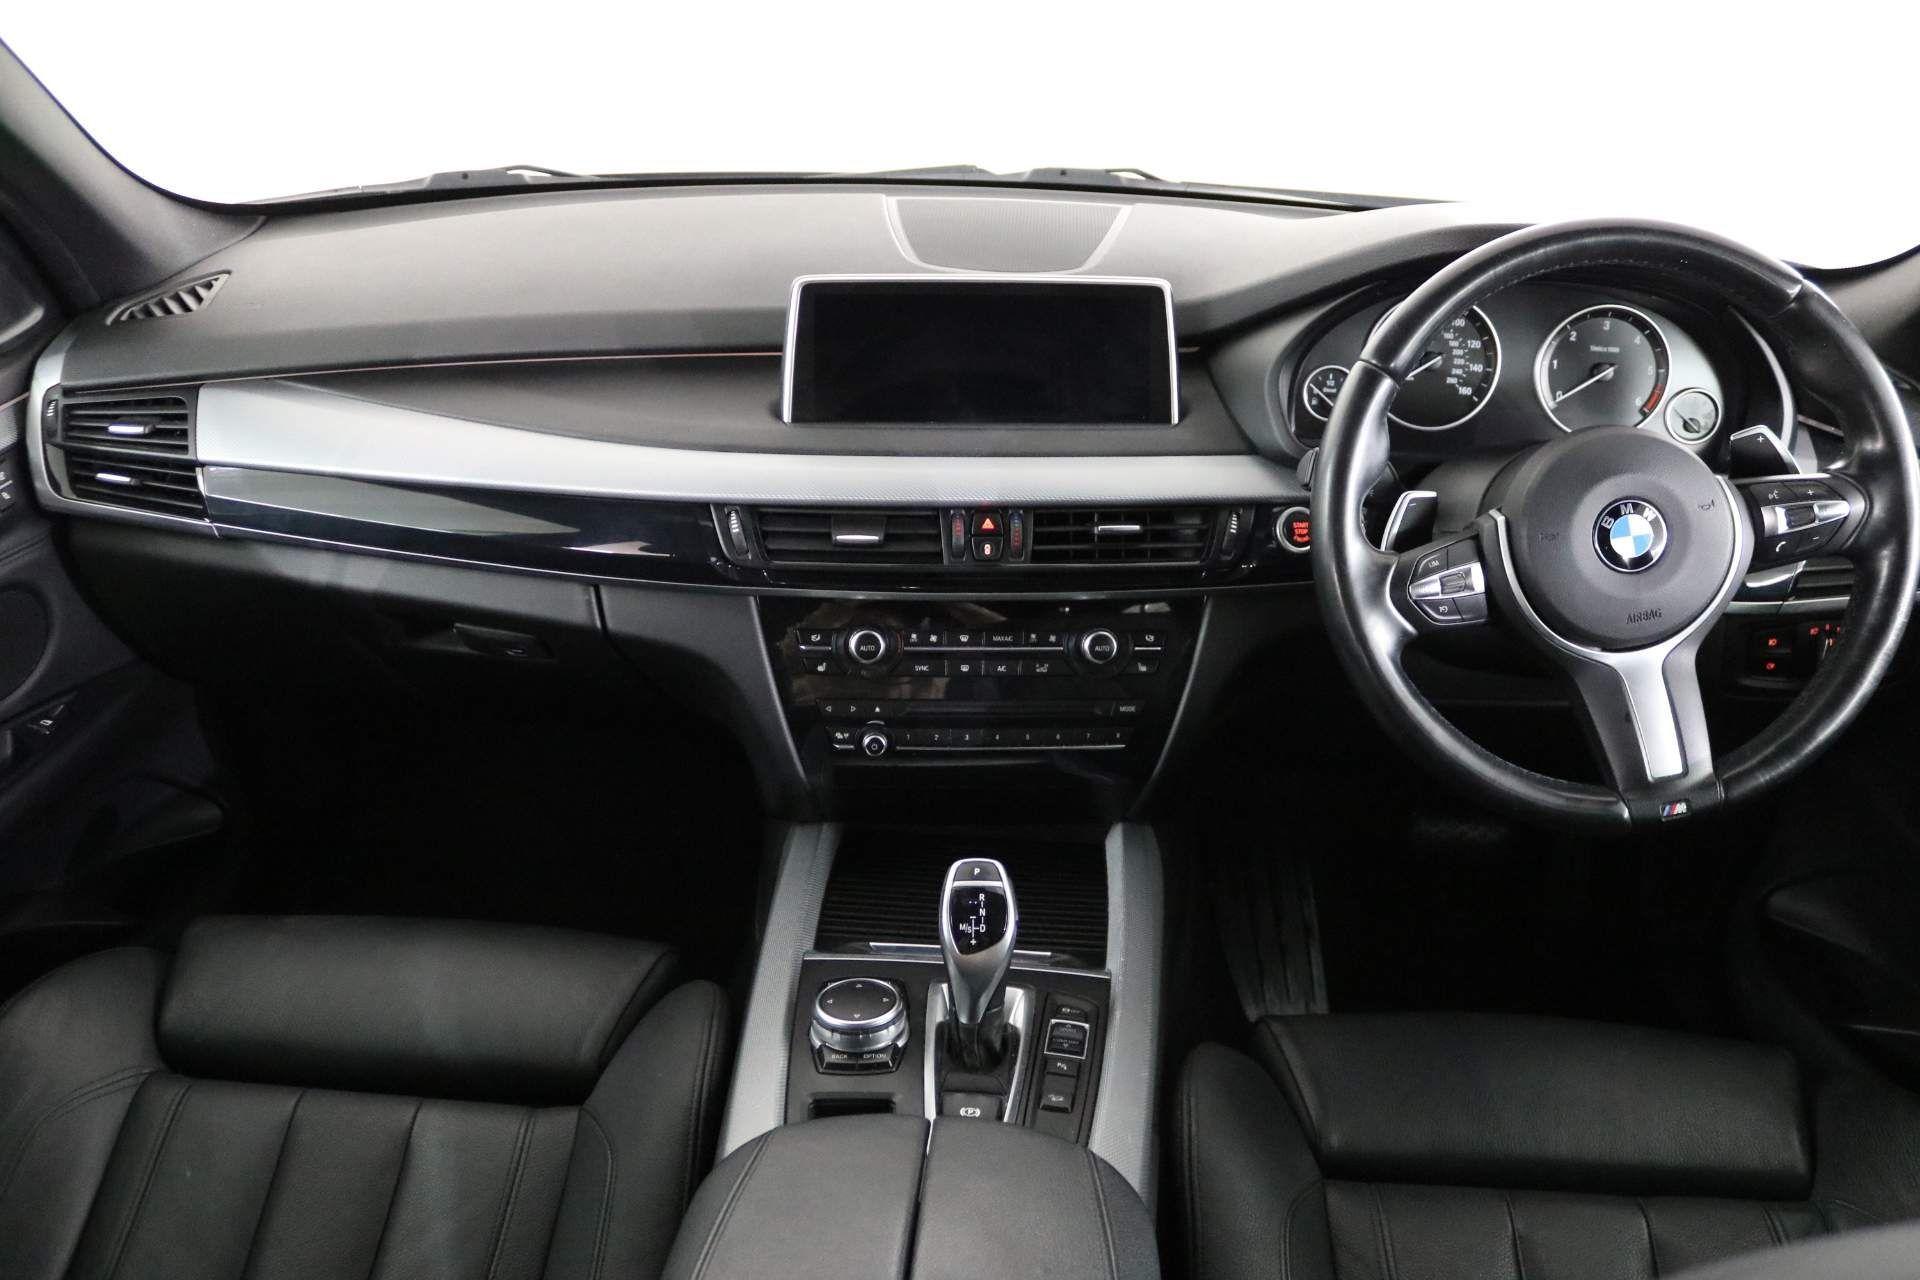 "BMW X5 3.0d xDrive""Auto"" Special Equipment - 15 Reg - 7 Seater -Leather - Sat Nav -Mega Spec- No Vat - Image 10 of 13"